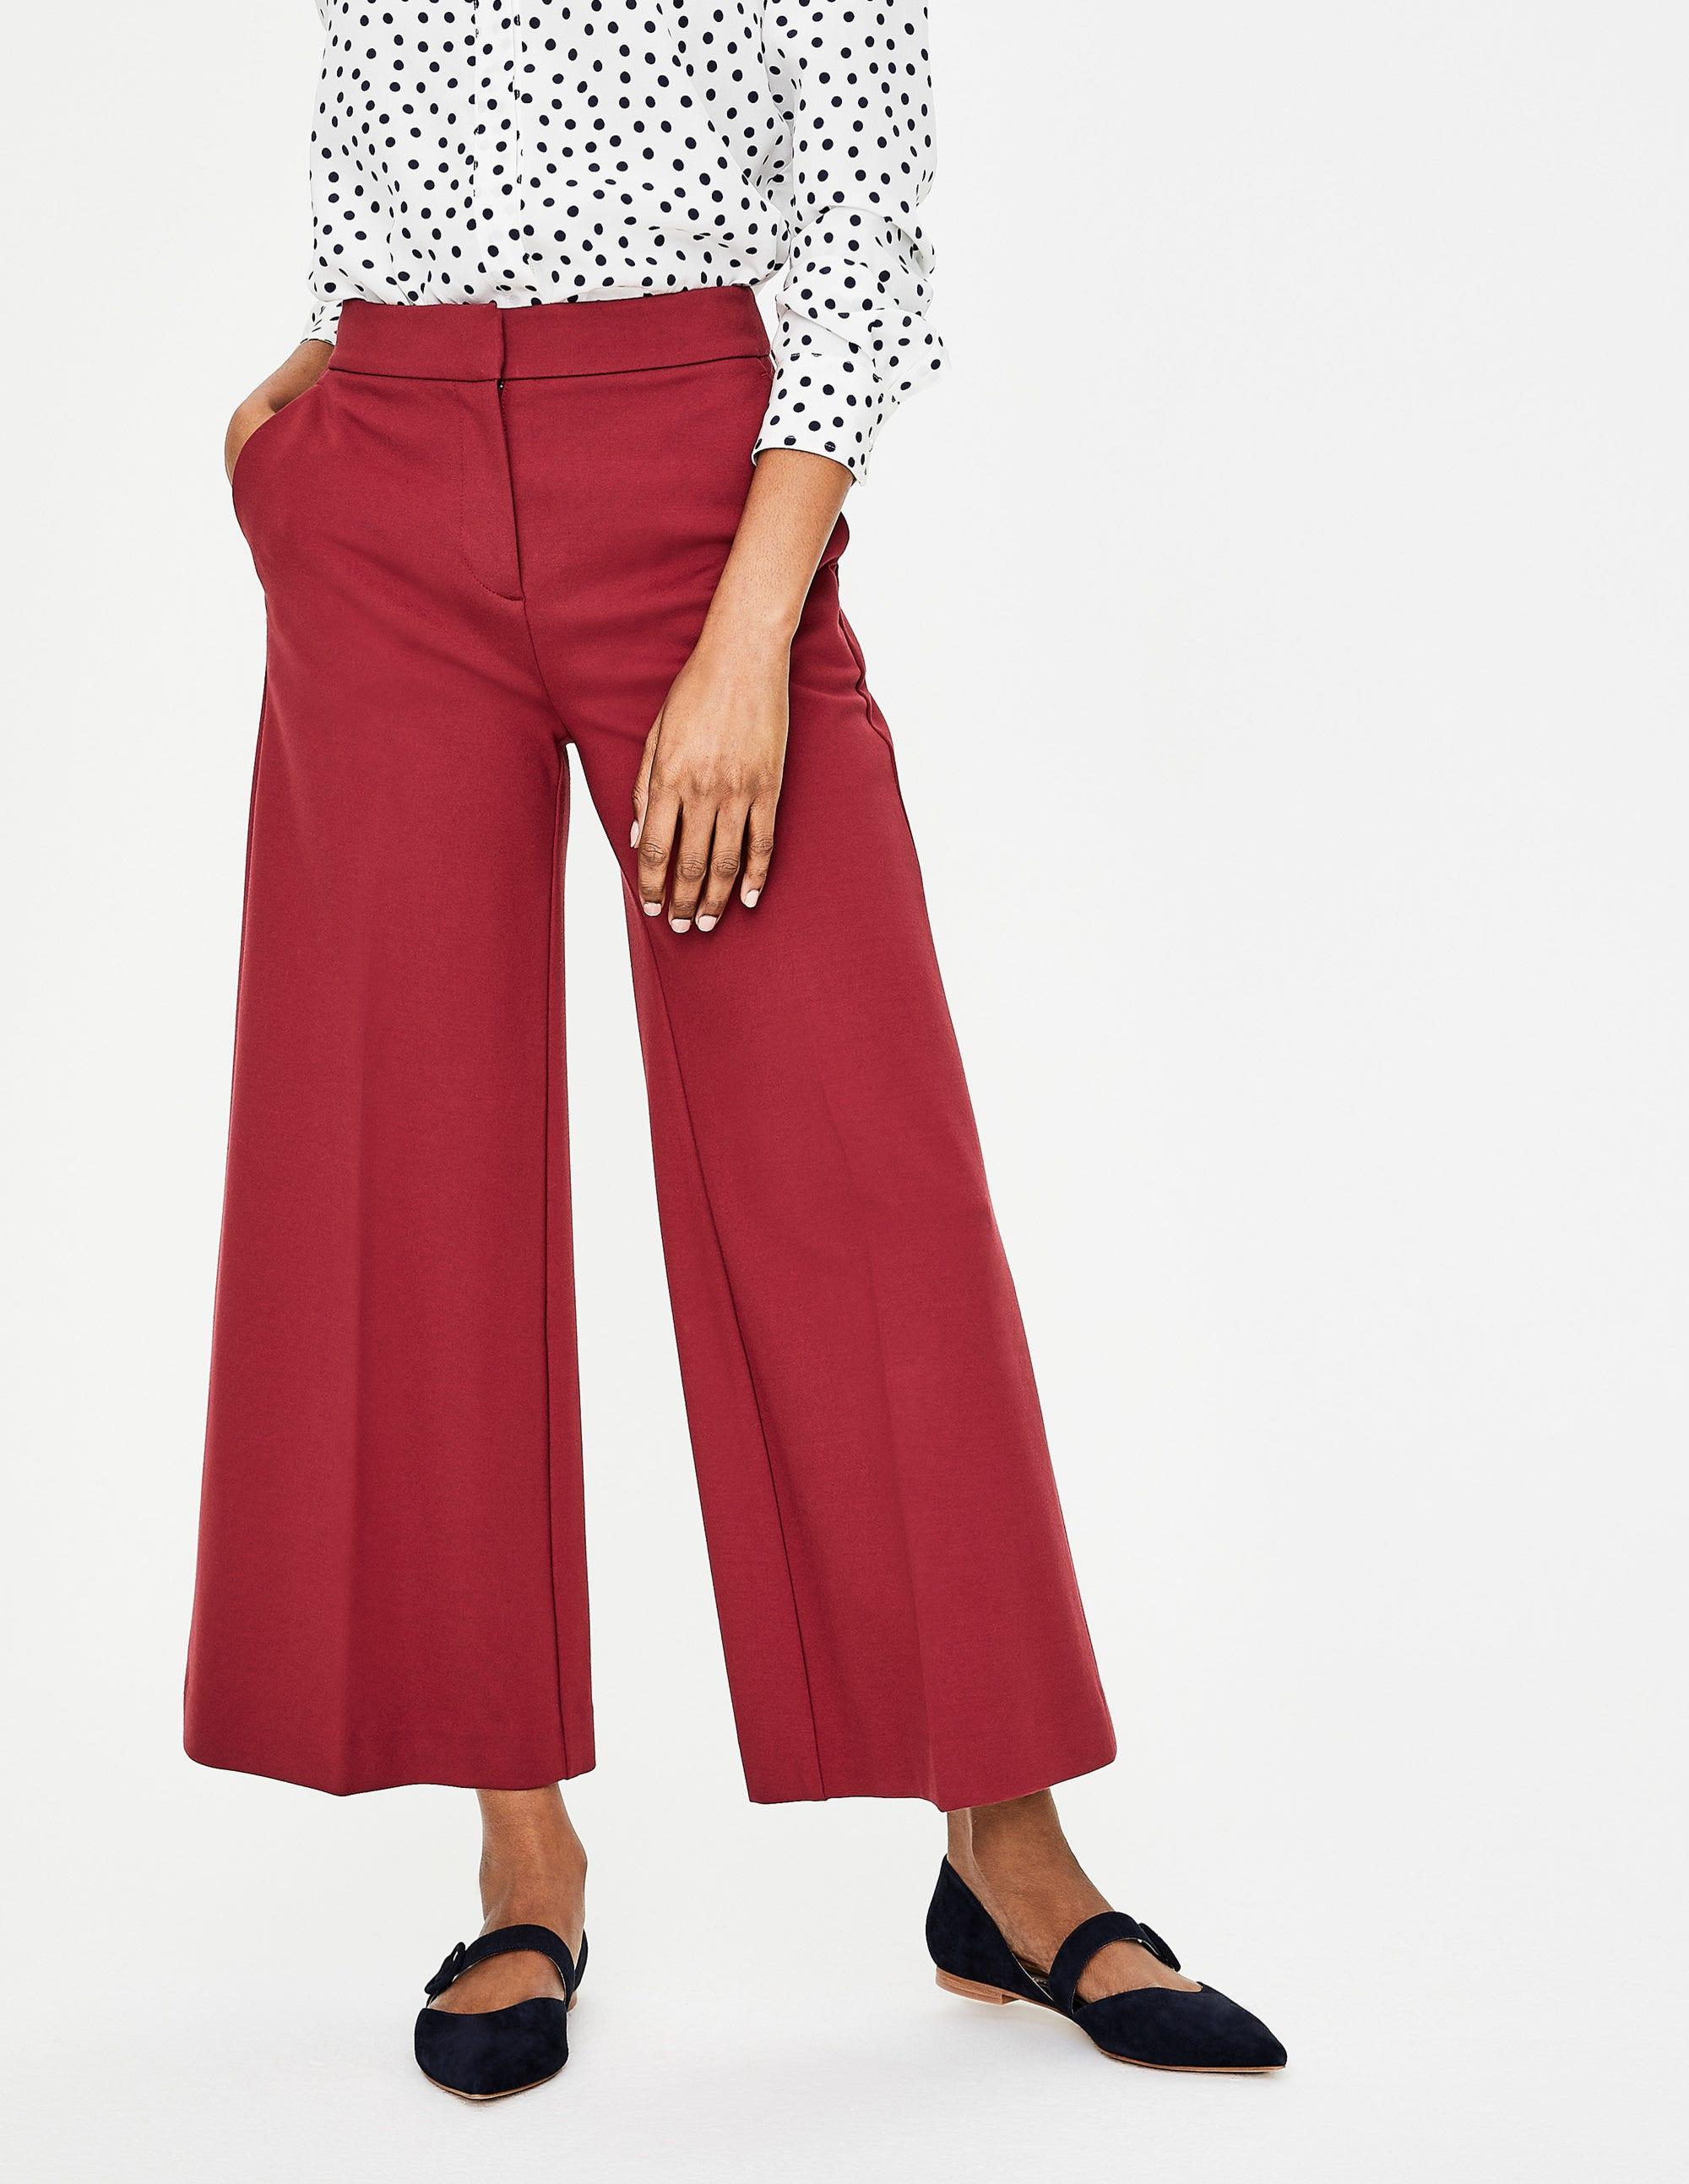 red pants winter wardrobe